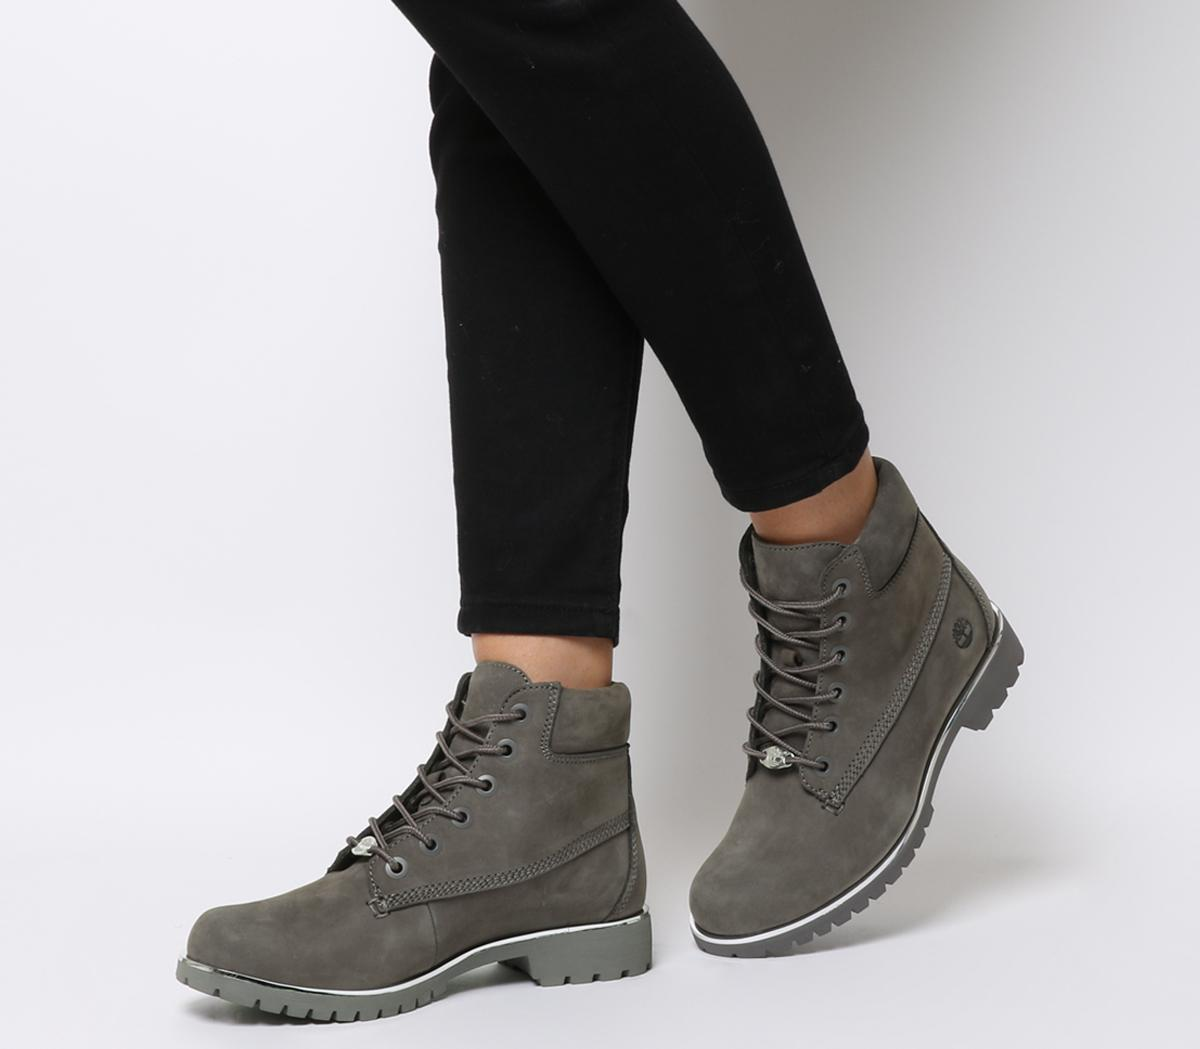 timberland slim premium 6 inch bottes of grey